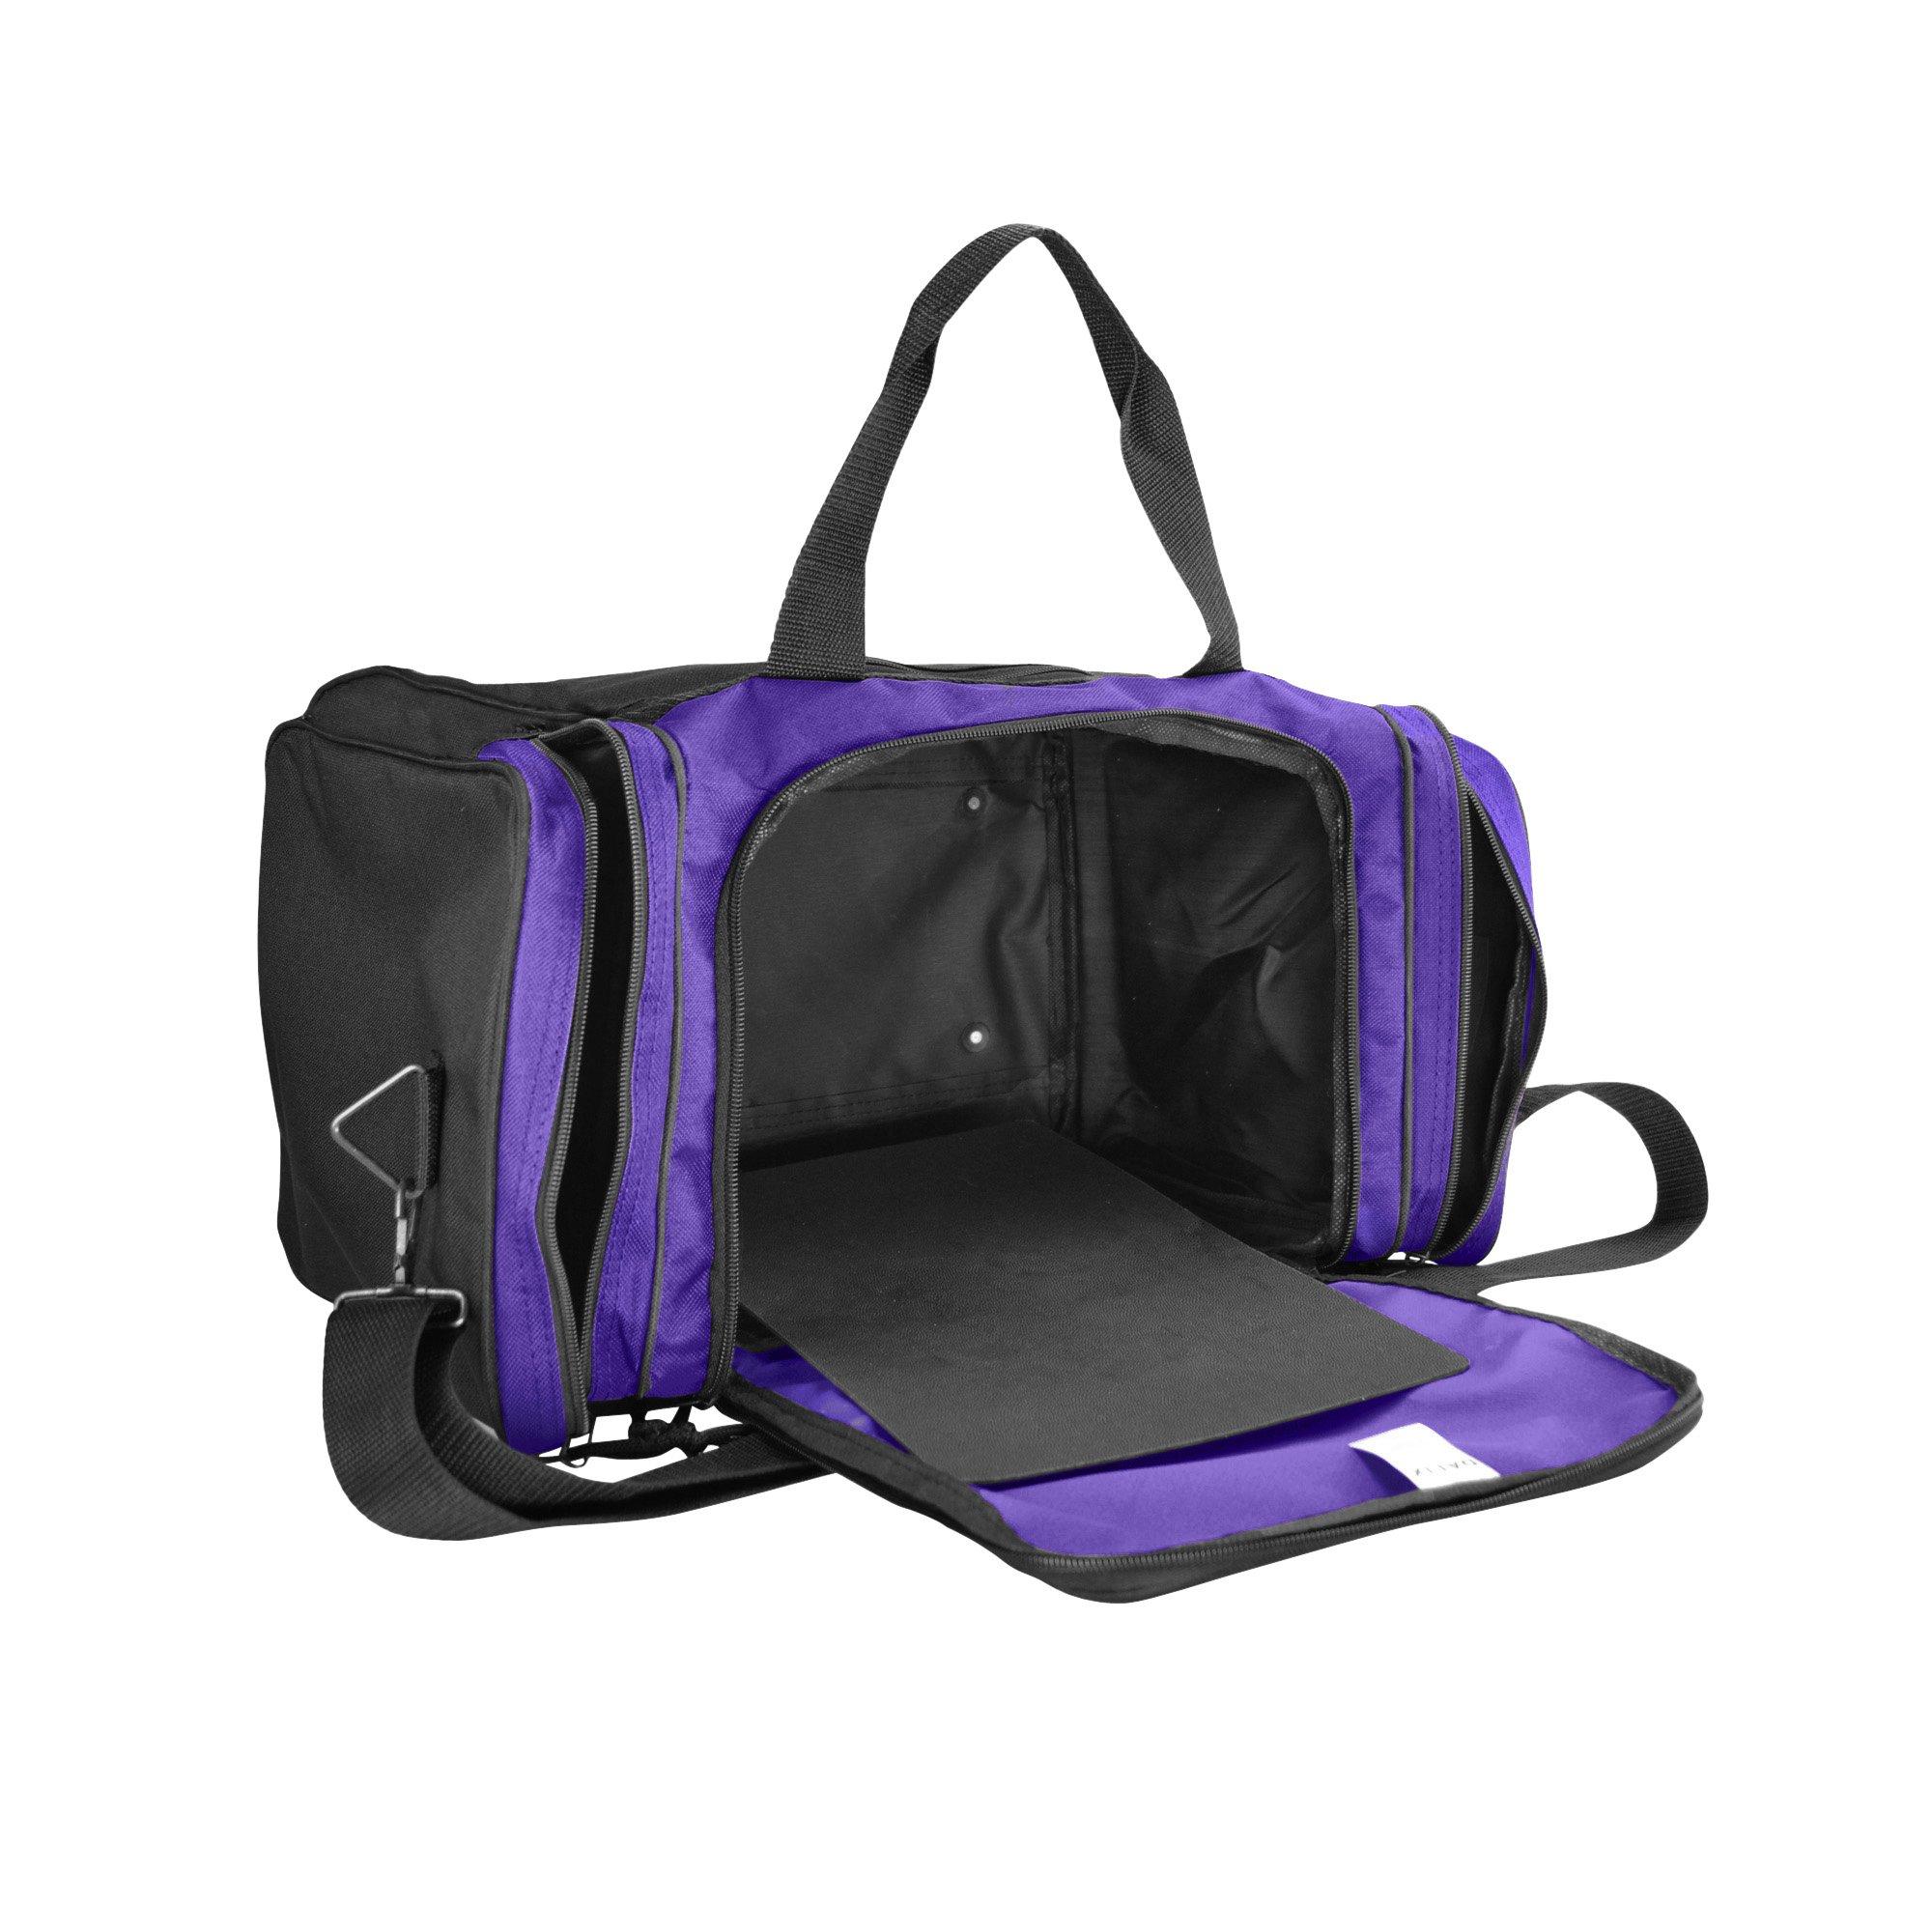 bc535b1aa882 Blank Duffle Bag Duffel Bag in Black and Purple Gym Bag - DF-005 ...